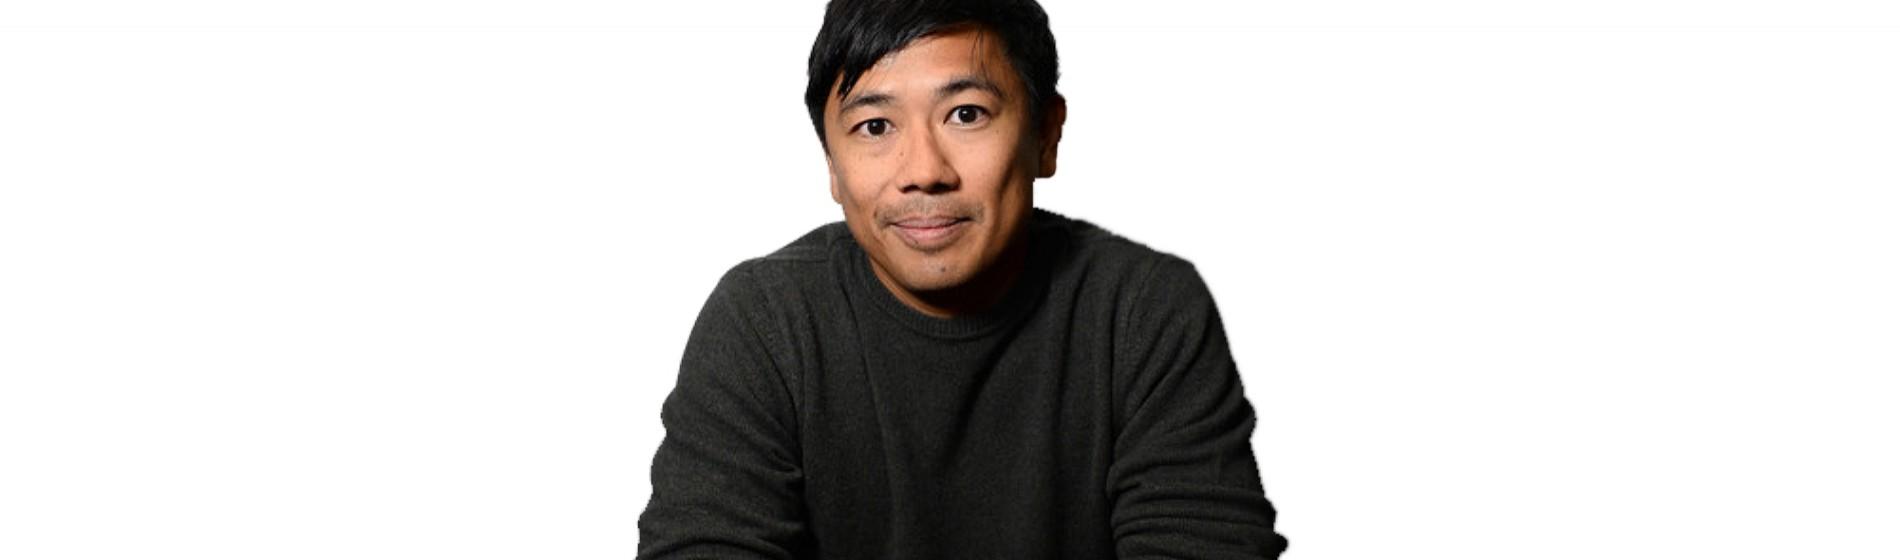 David Lynch: The Art Life Jon Nguyen